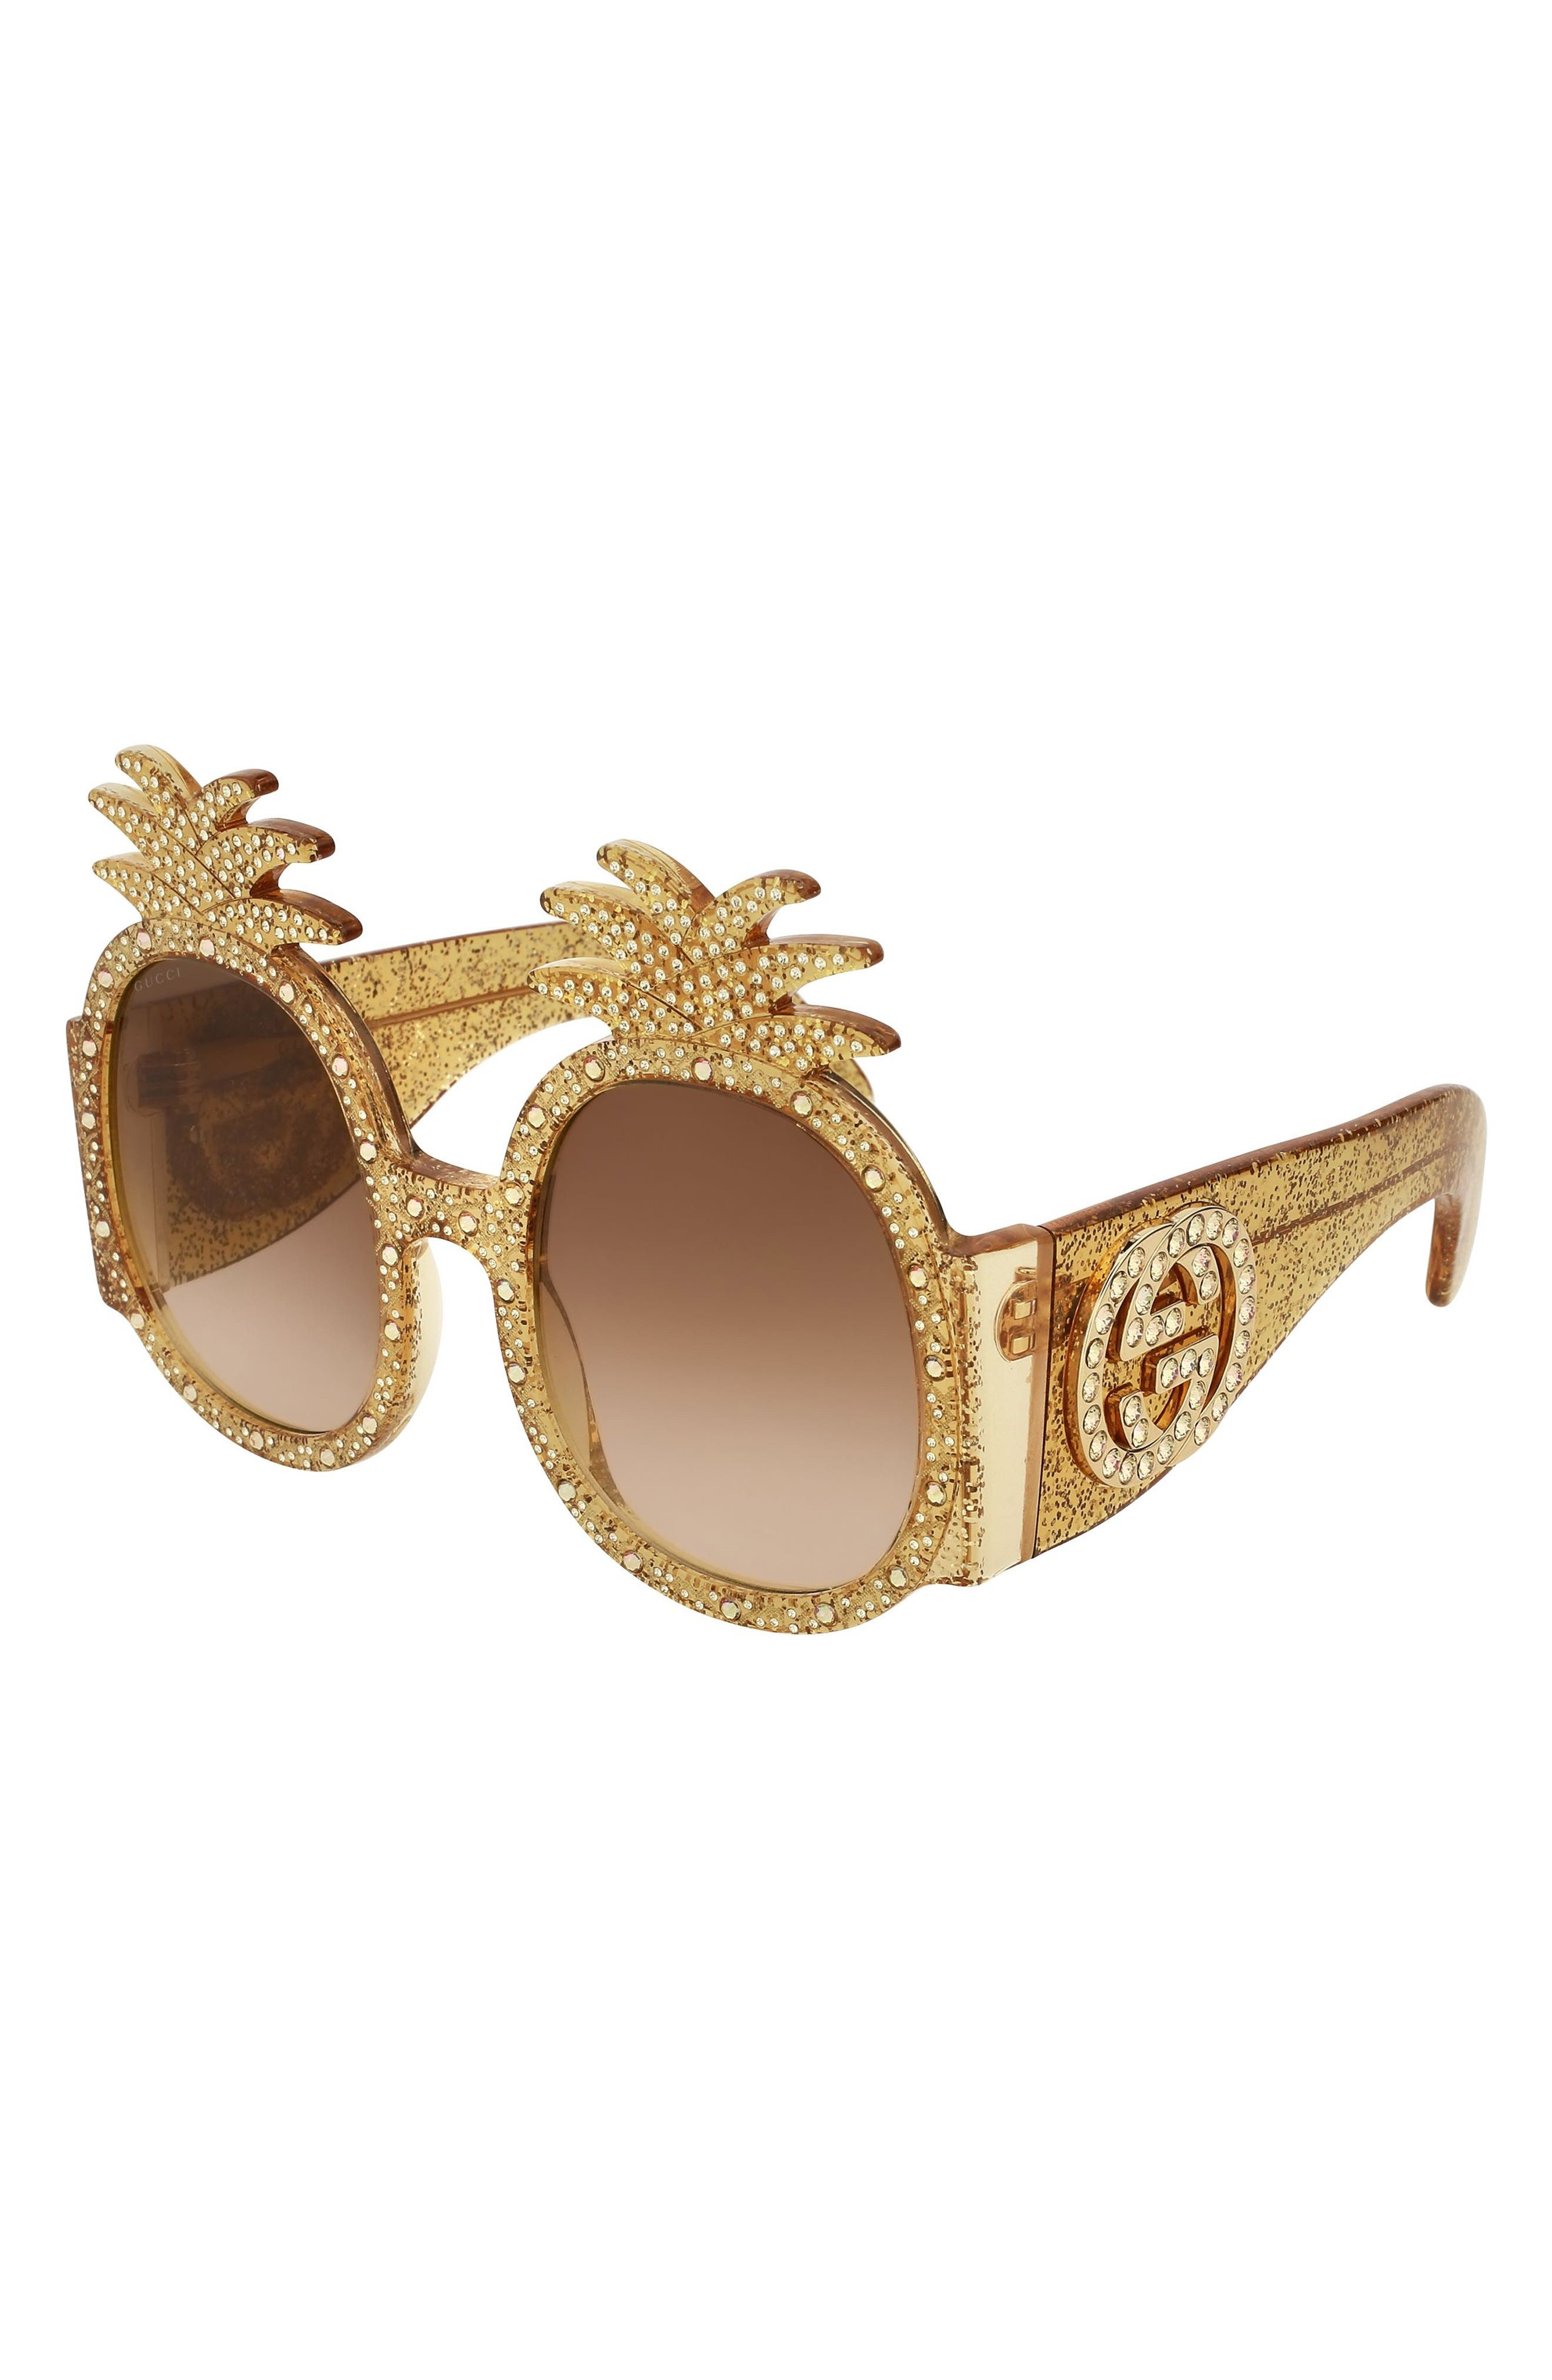 53mm Pineapple Sunglasses,                             Alternate thumbnail 2, color,                             GOLD